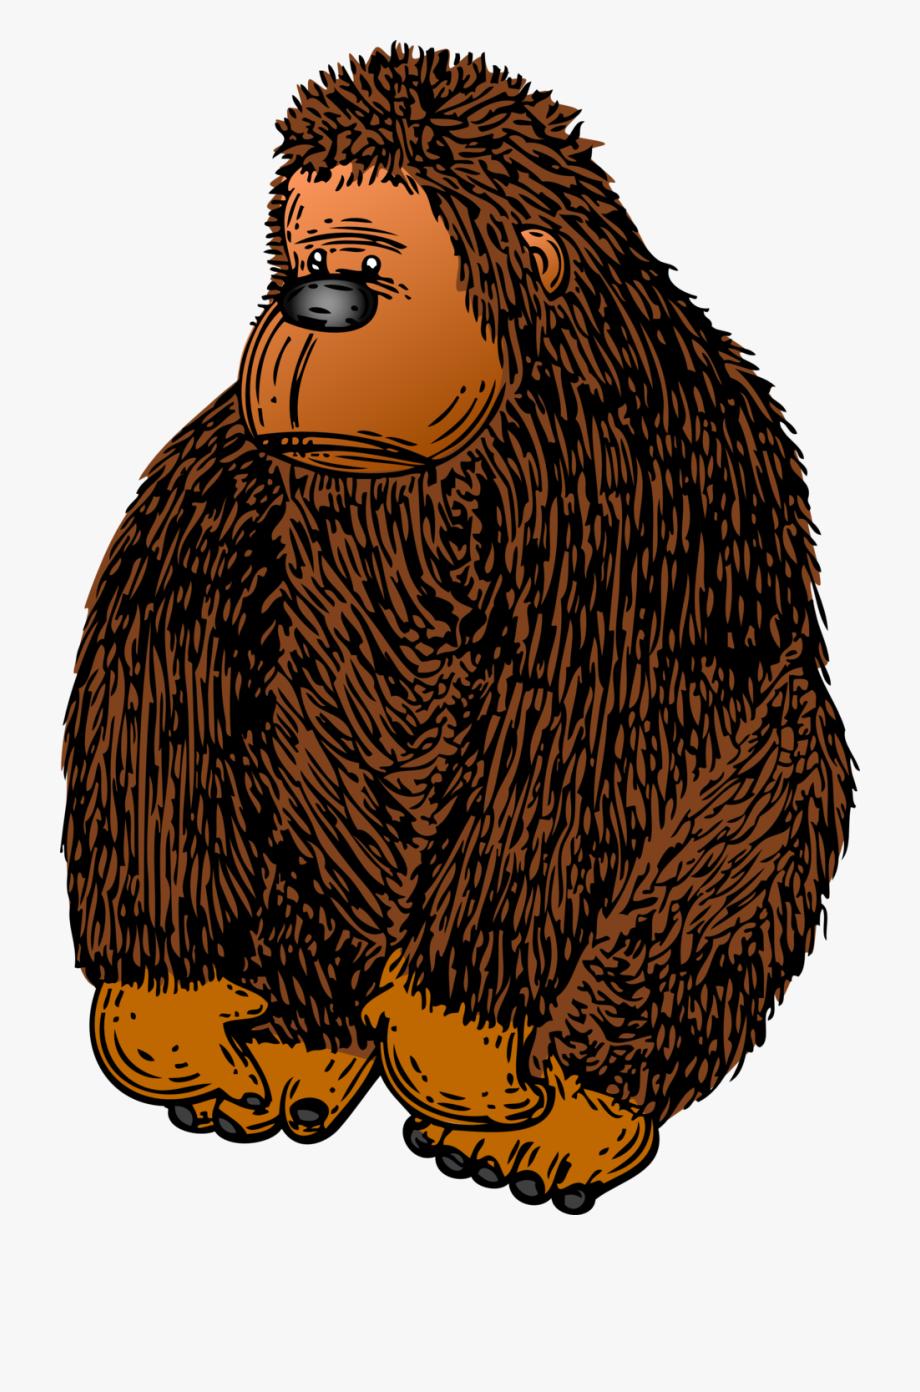 Brown Gorilla Clipart #311338.